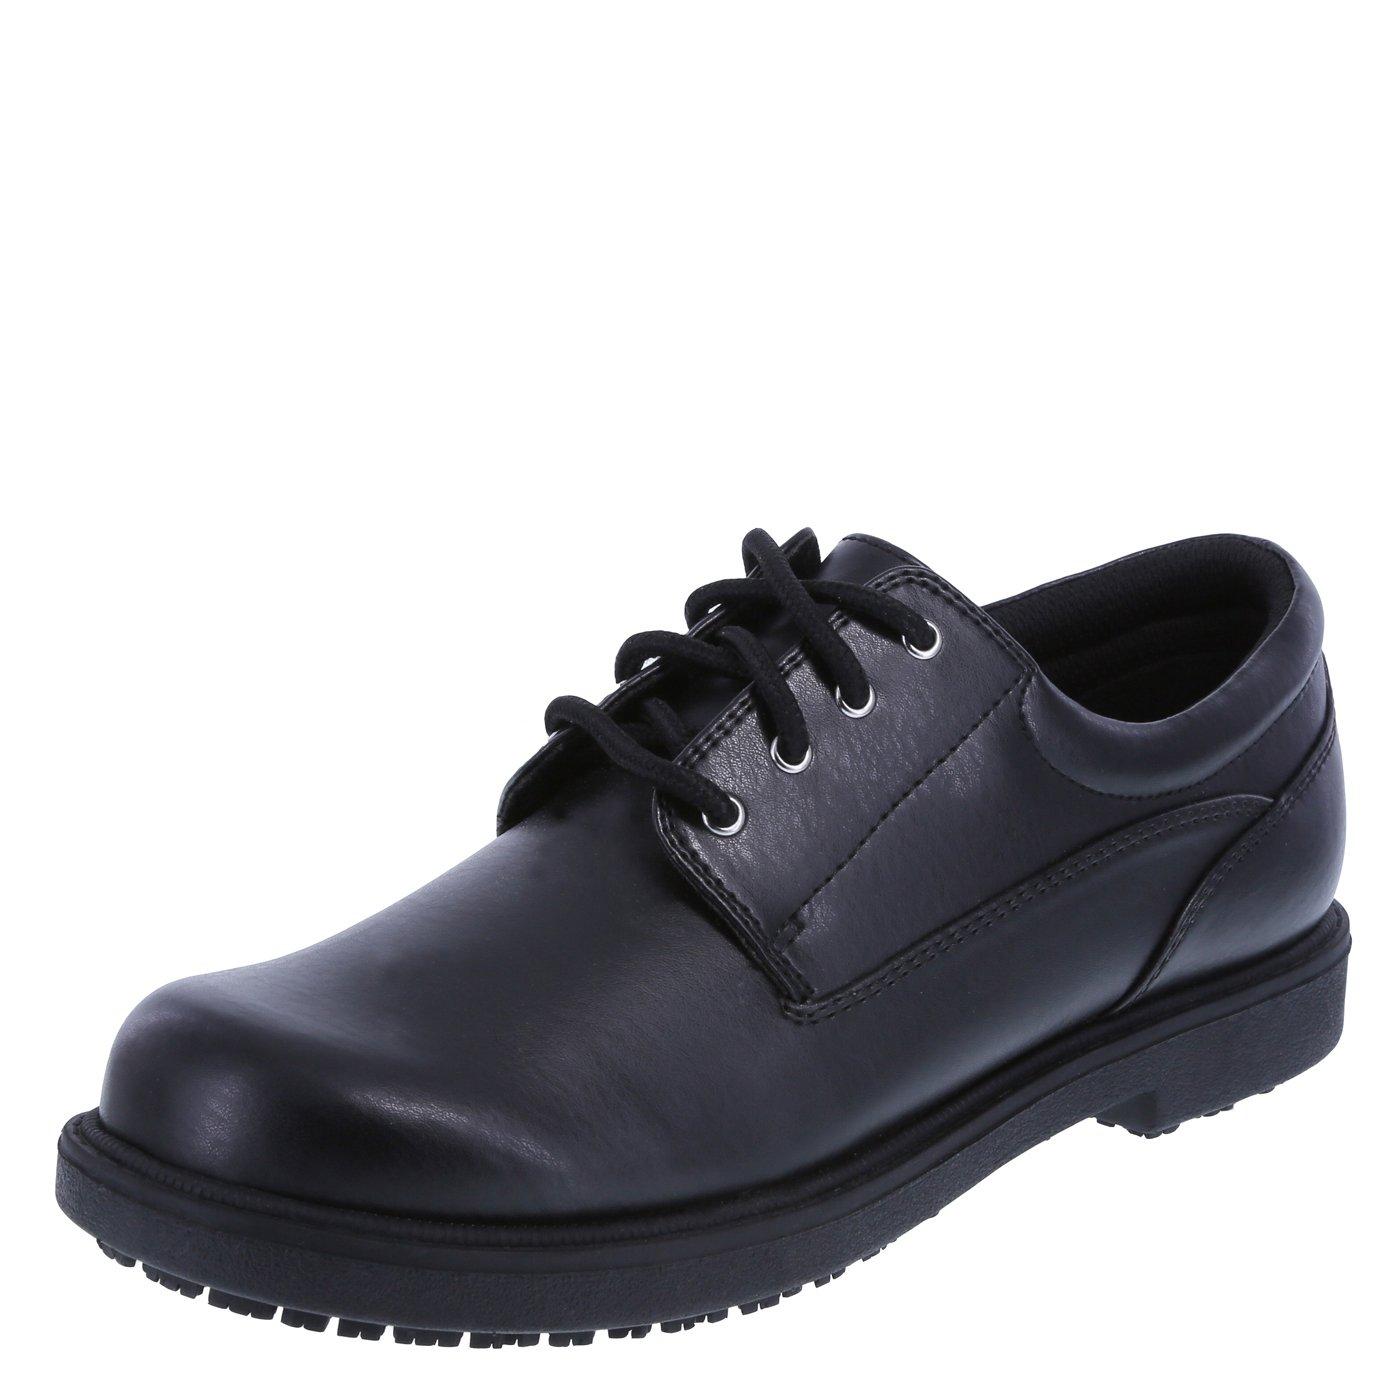 safeTstep Slip Resistant Women's Deidre Oxford B01J91HB66 5 W US|Black